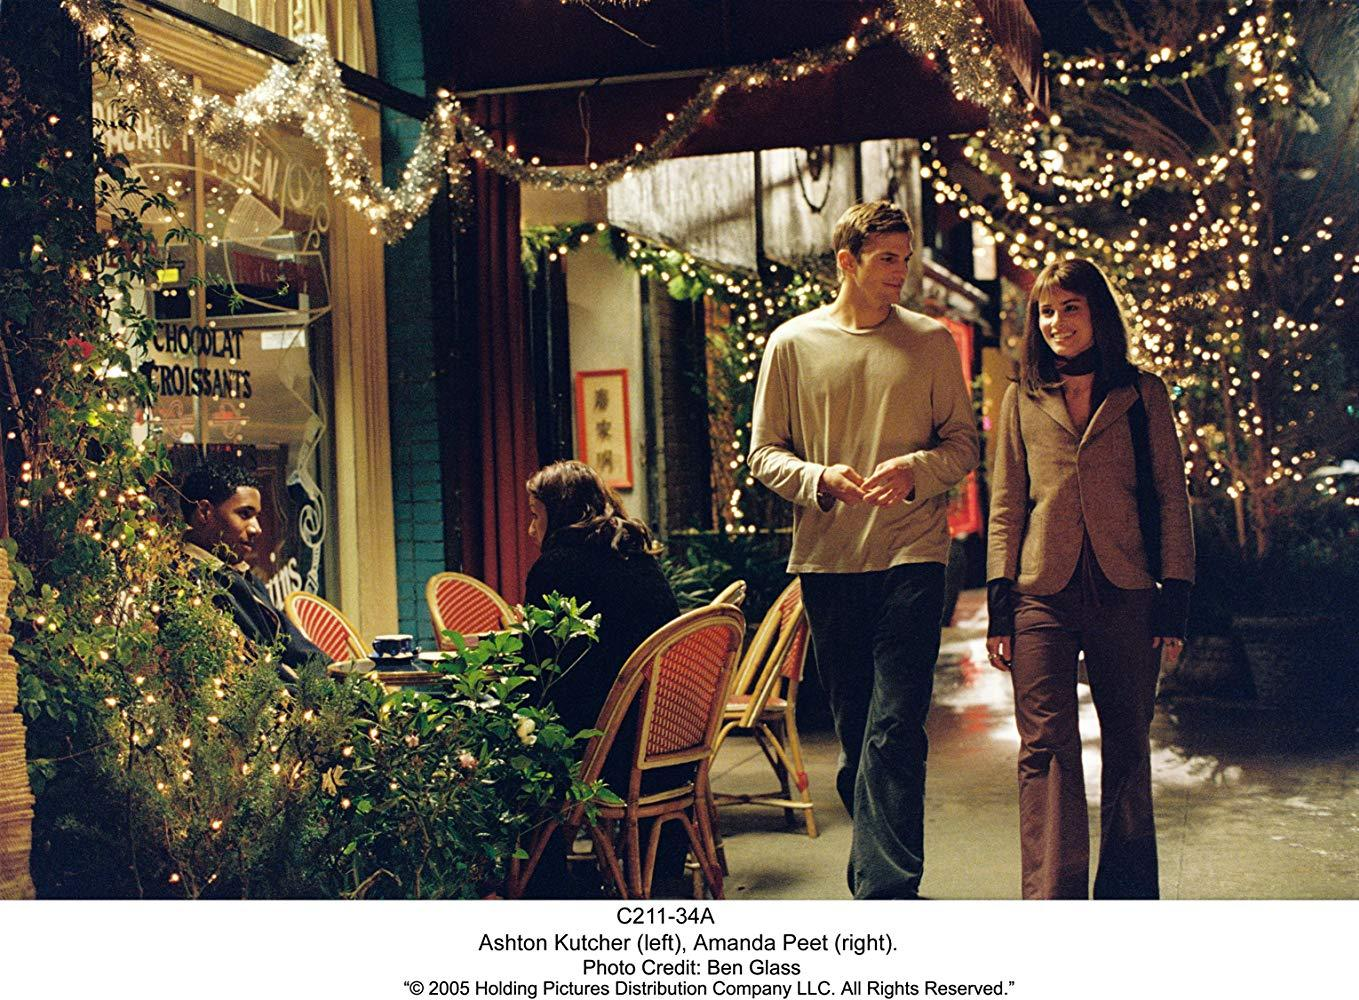 مشاهدة فيلم A Lot Like Love 2005 HD مترجم كامل اون لاين